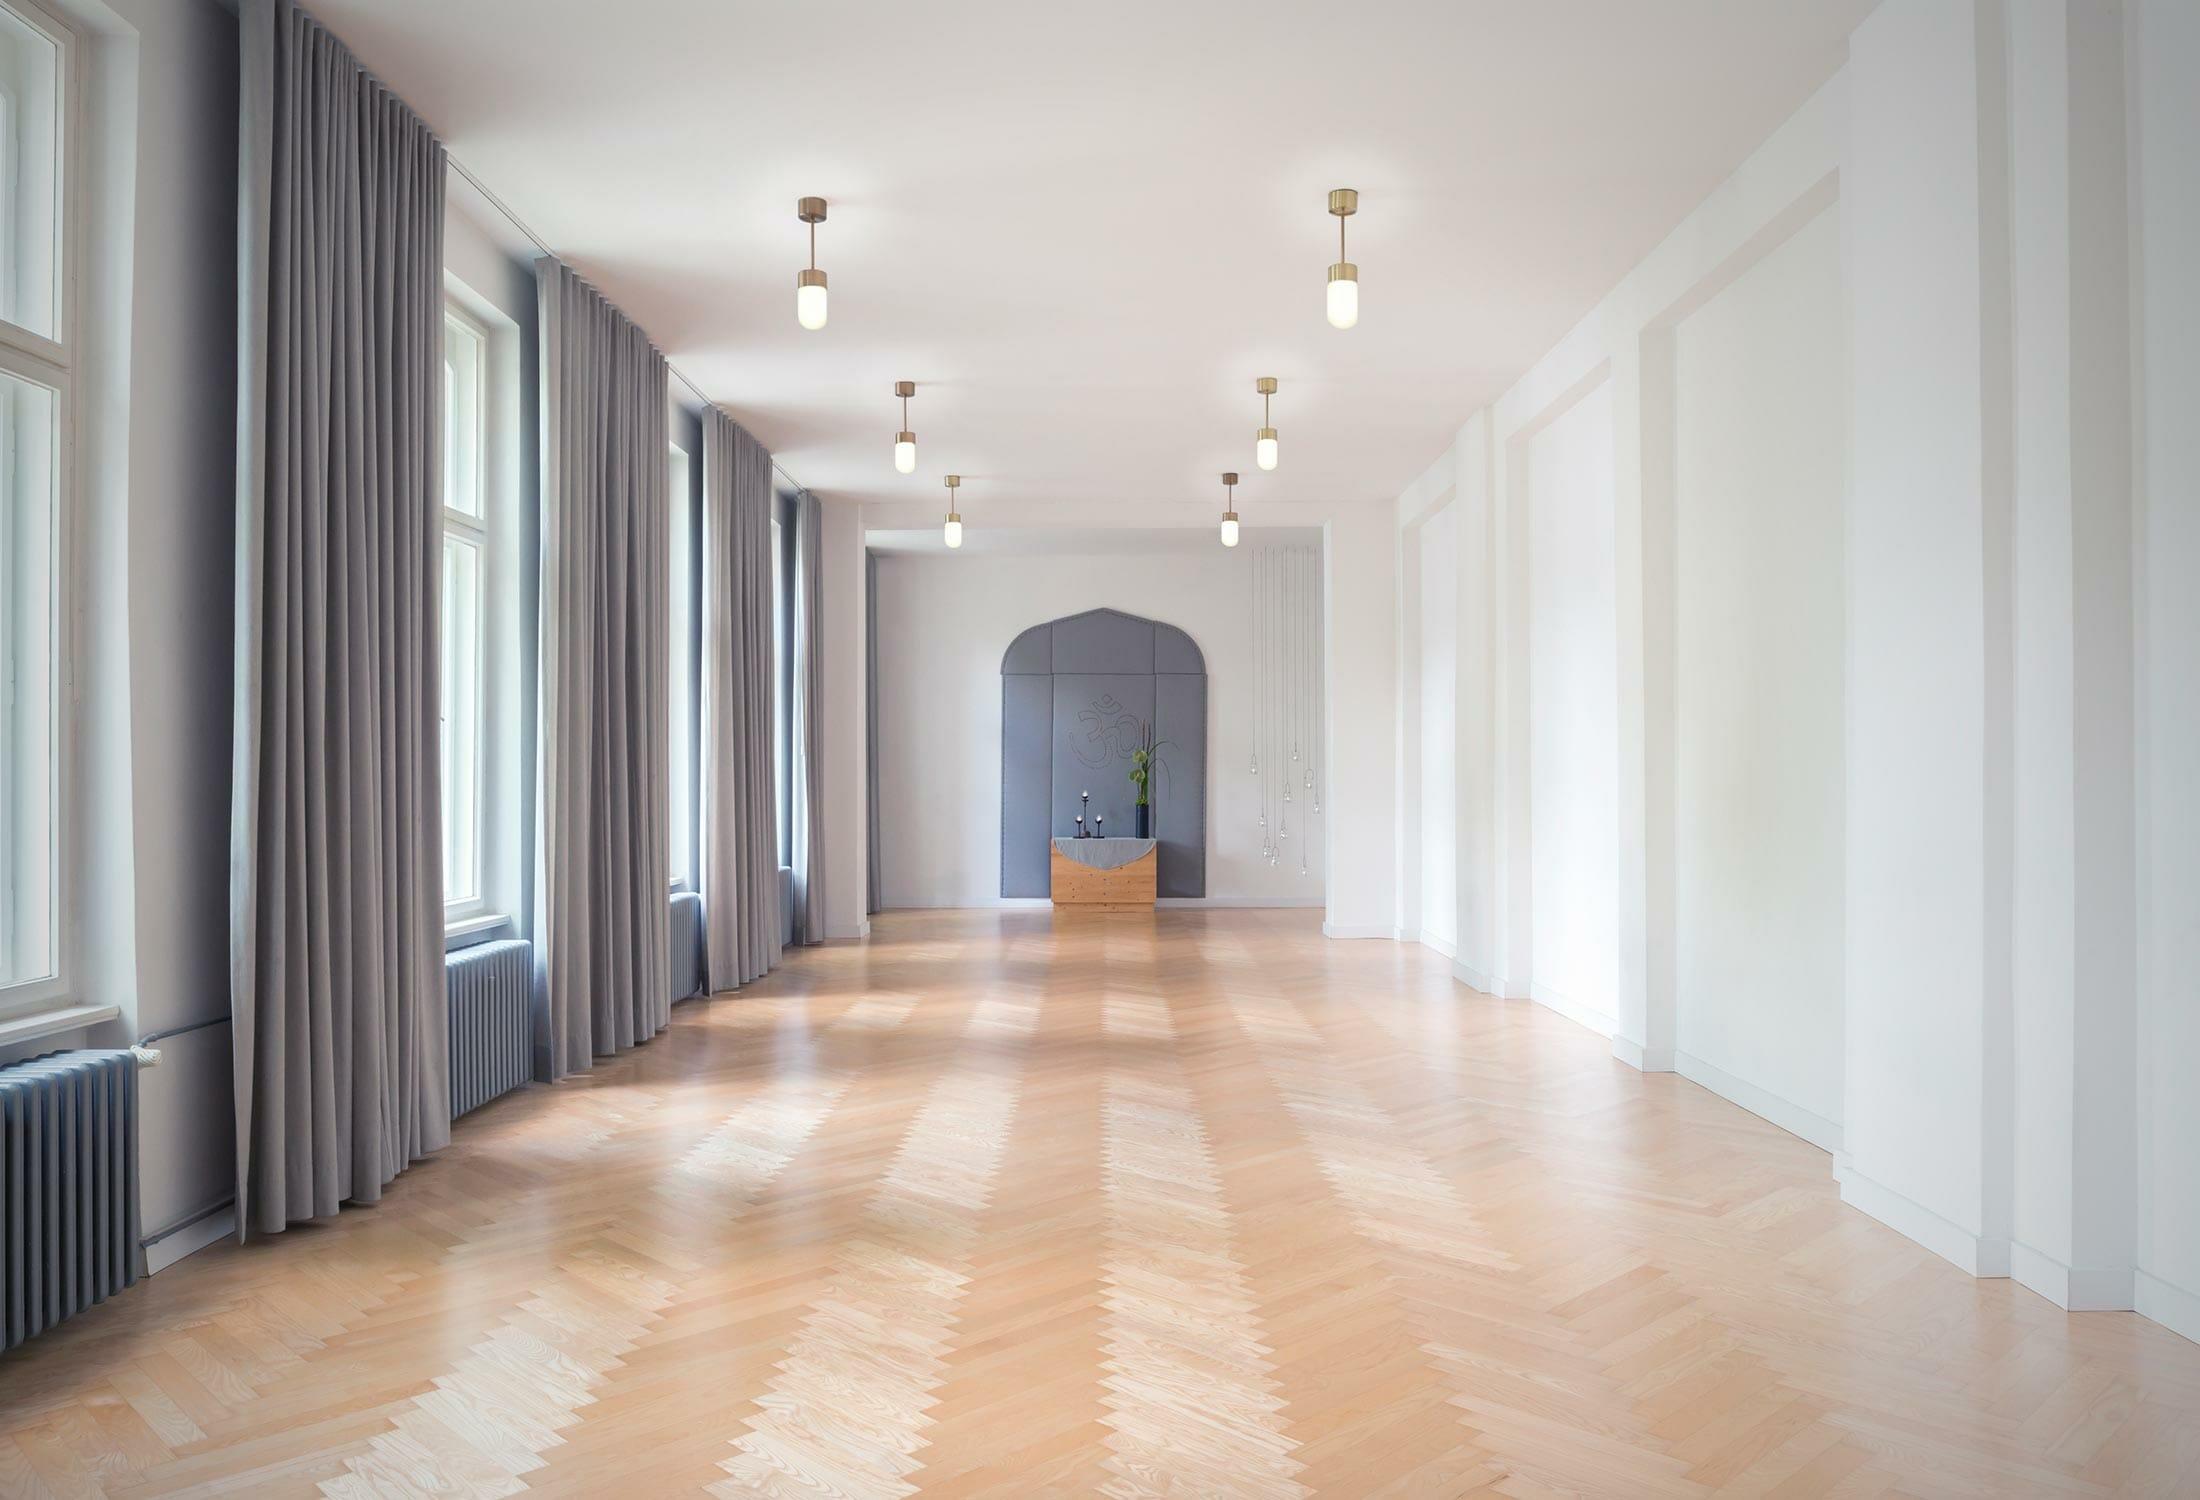 Spirit Yoga Studio Zehlendorf Berlin Yogaraum